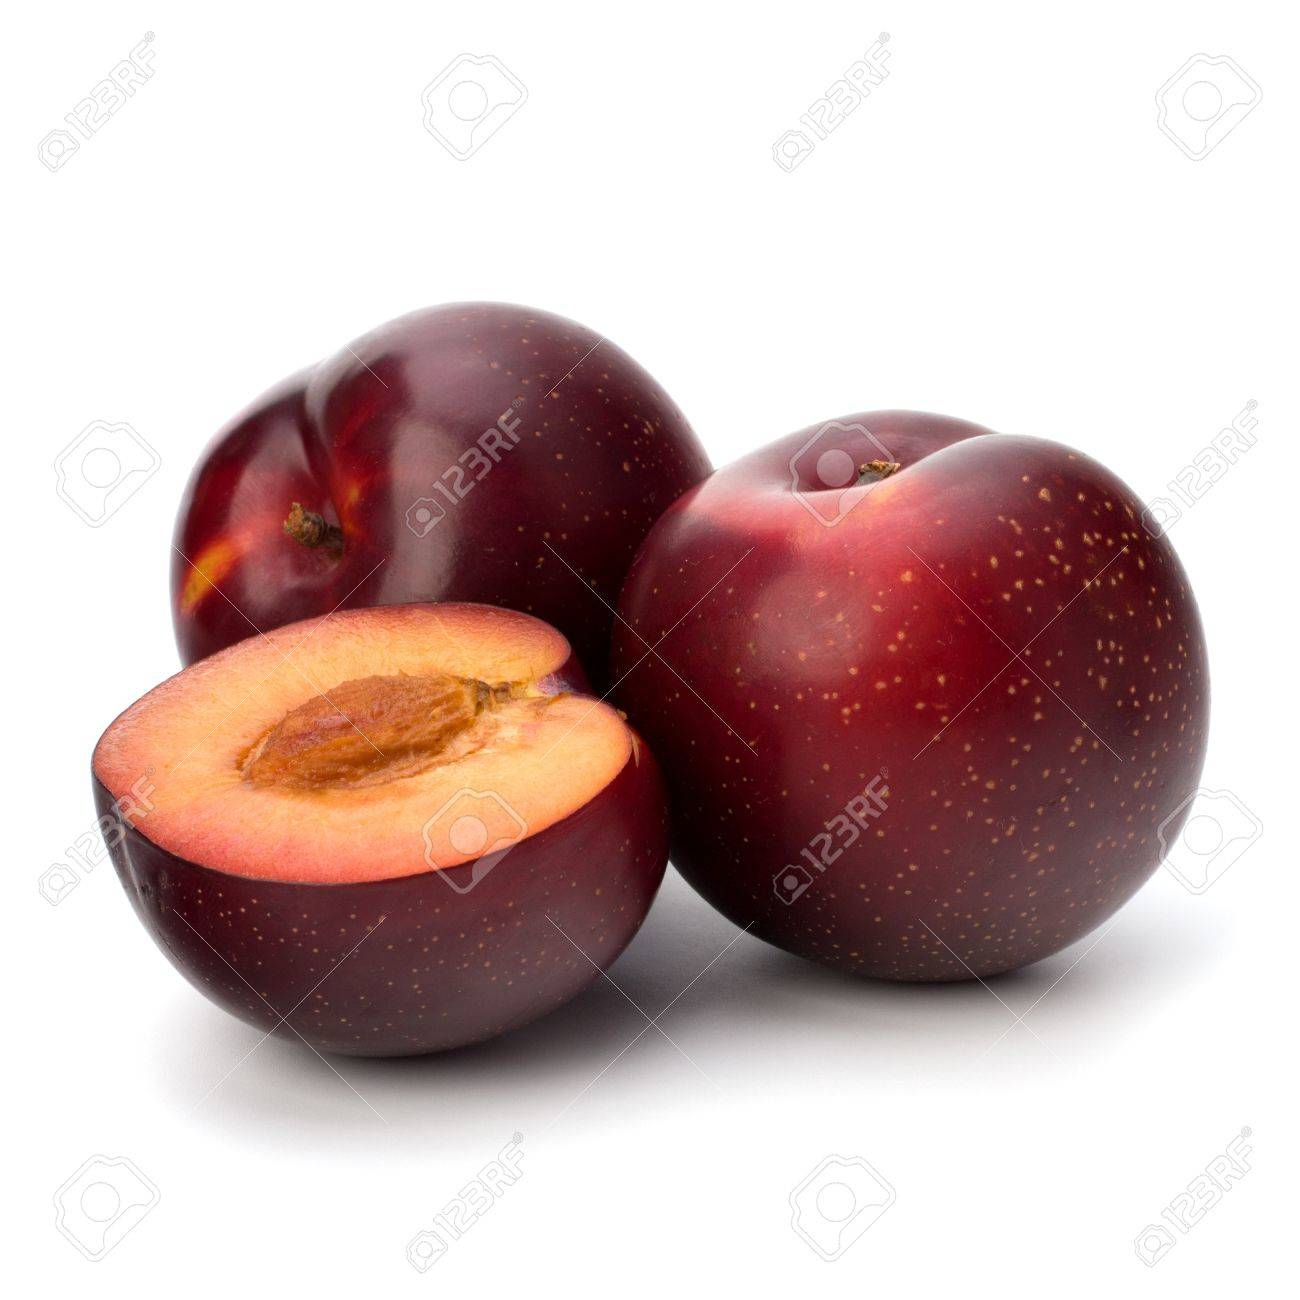 Red plum fruit isolated on white background Stock Photo - 13336130